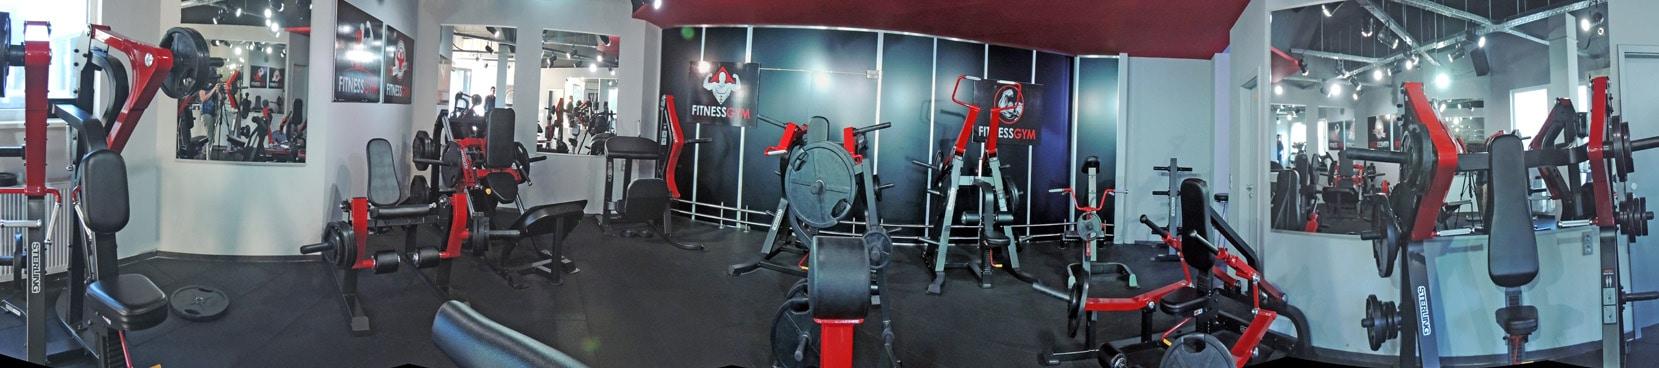 Fitnesspark Limburg Fitness Gym